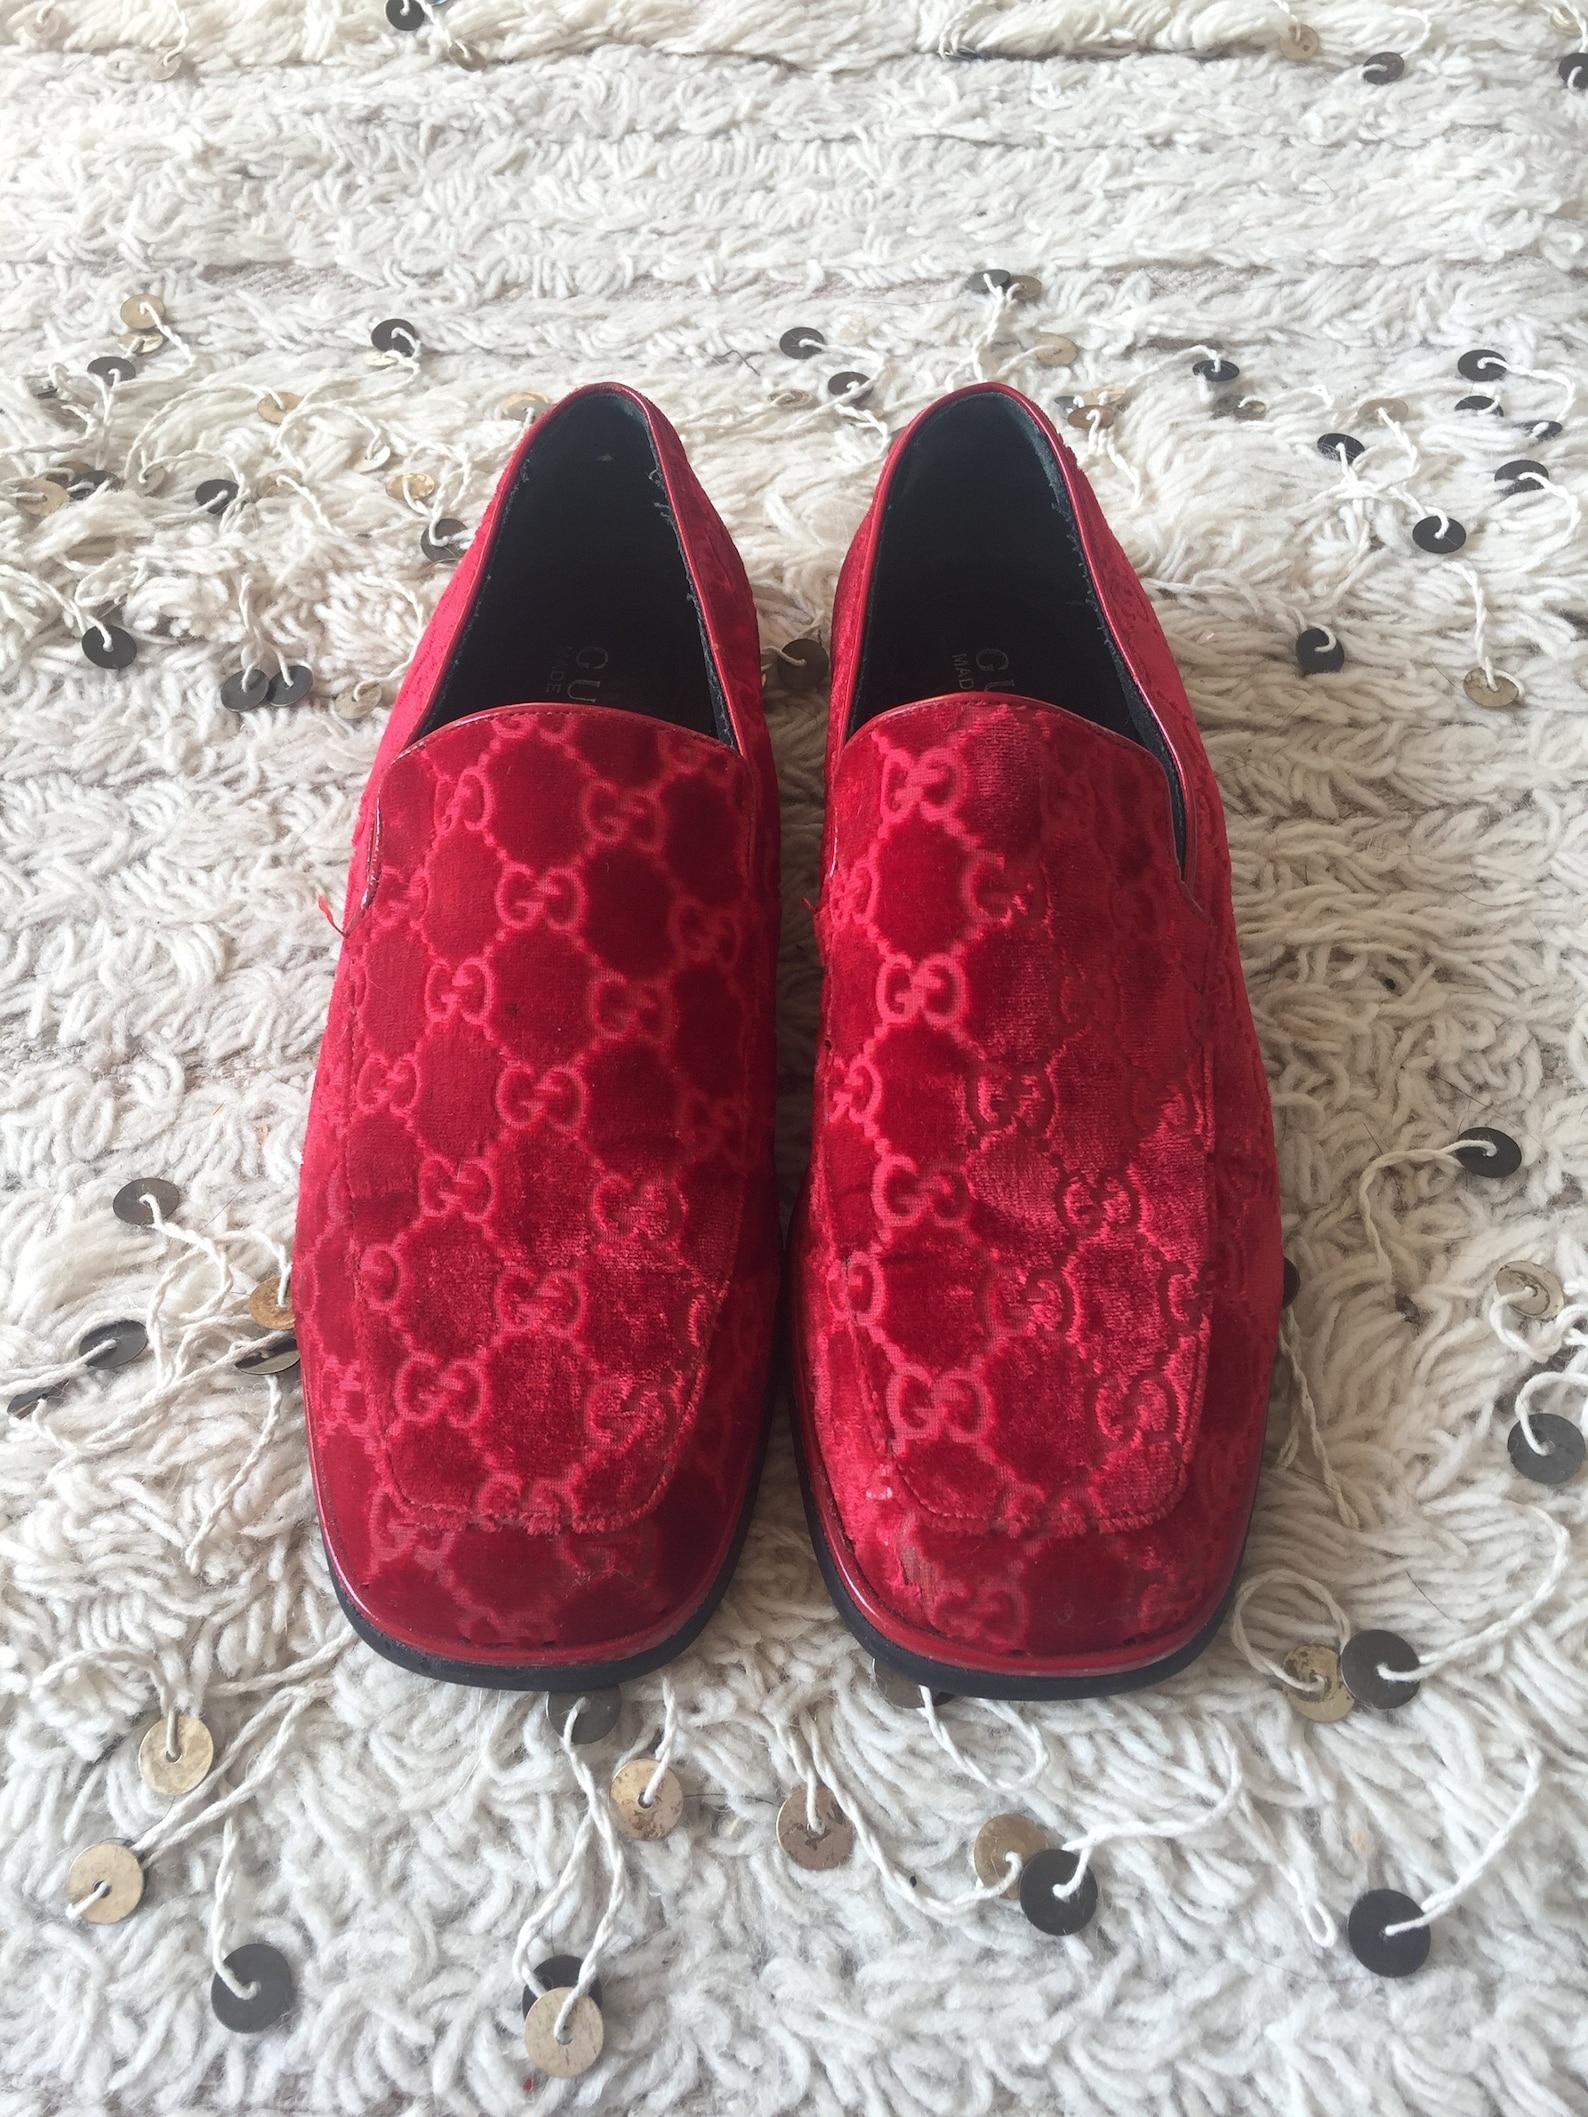 vintage gucci gg guccissima monogram red velvet flats ballet slippers loafers us 6.5 eu 36.5